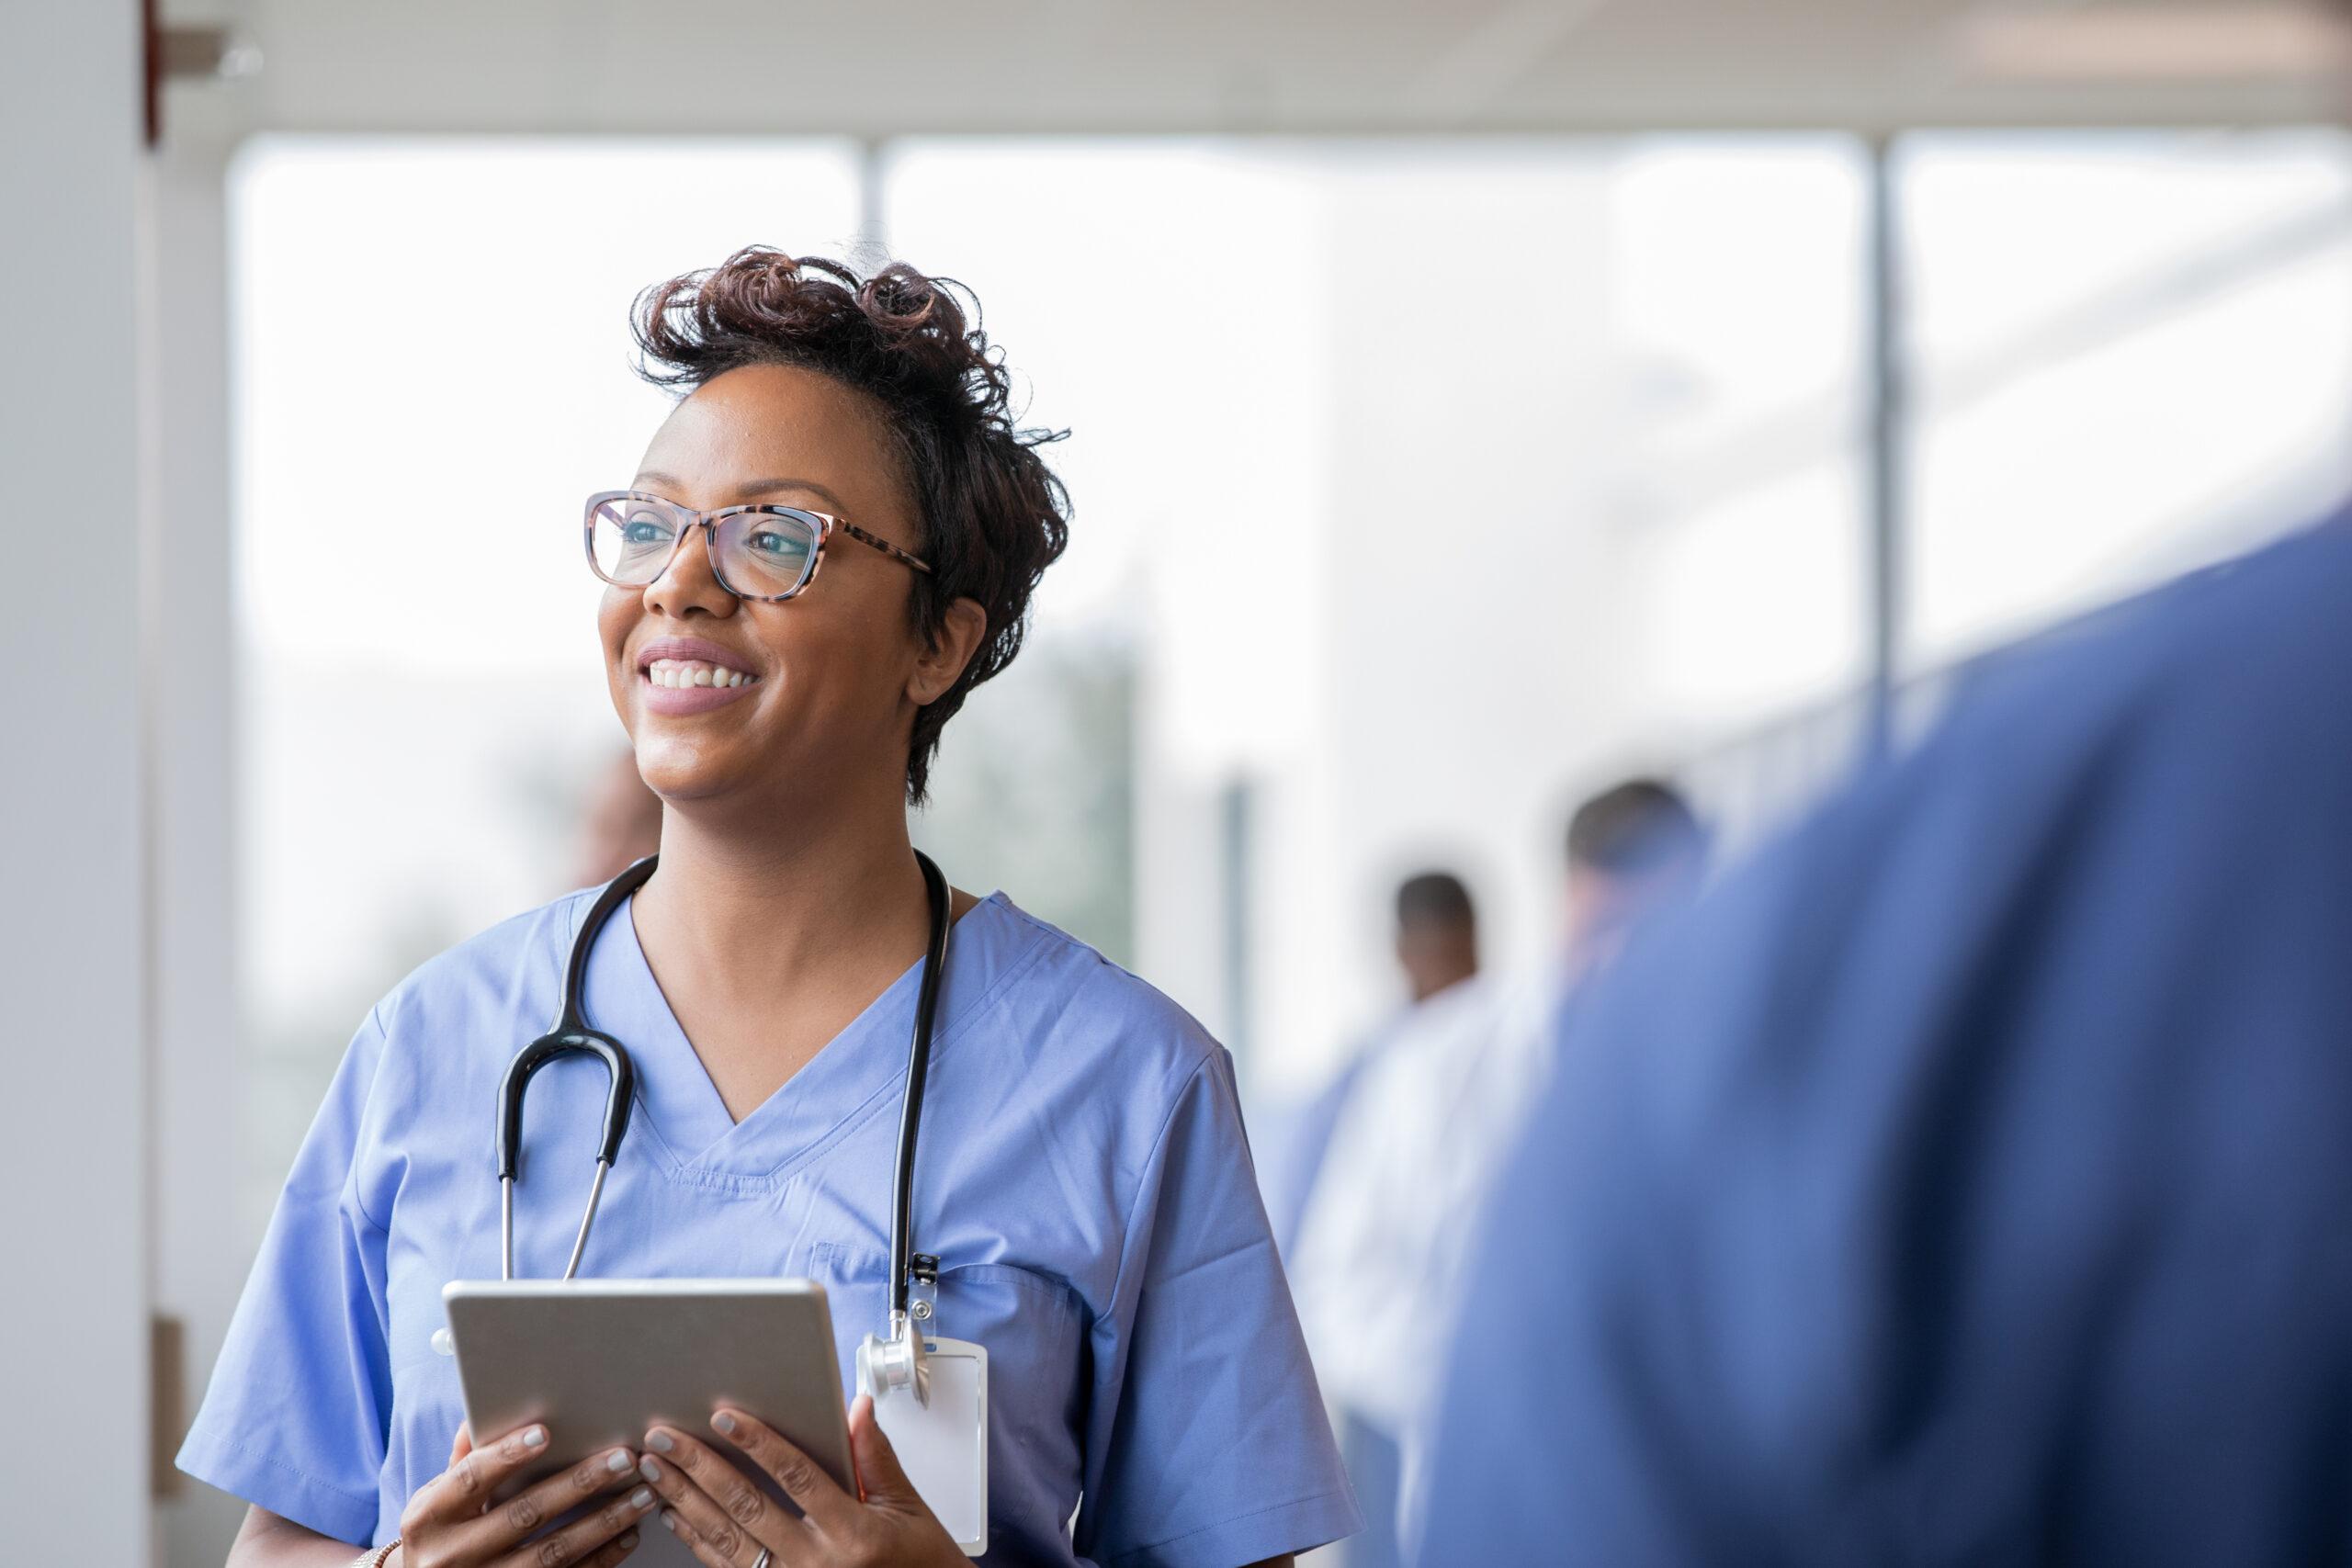 Nurse smiles while holding digital tablet